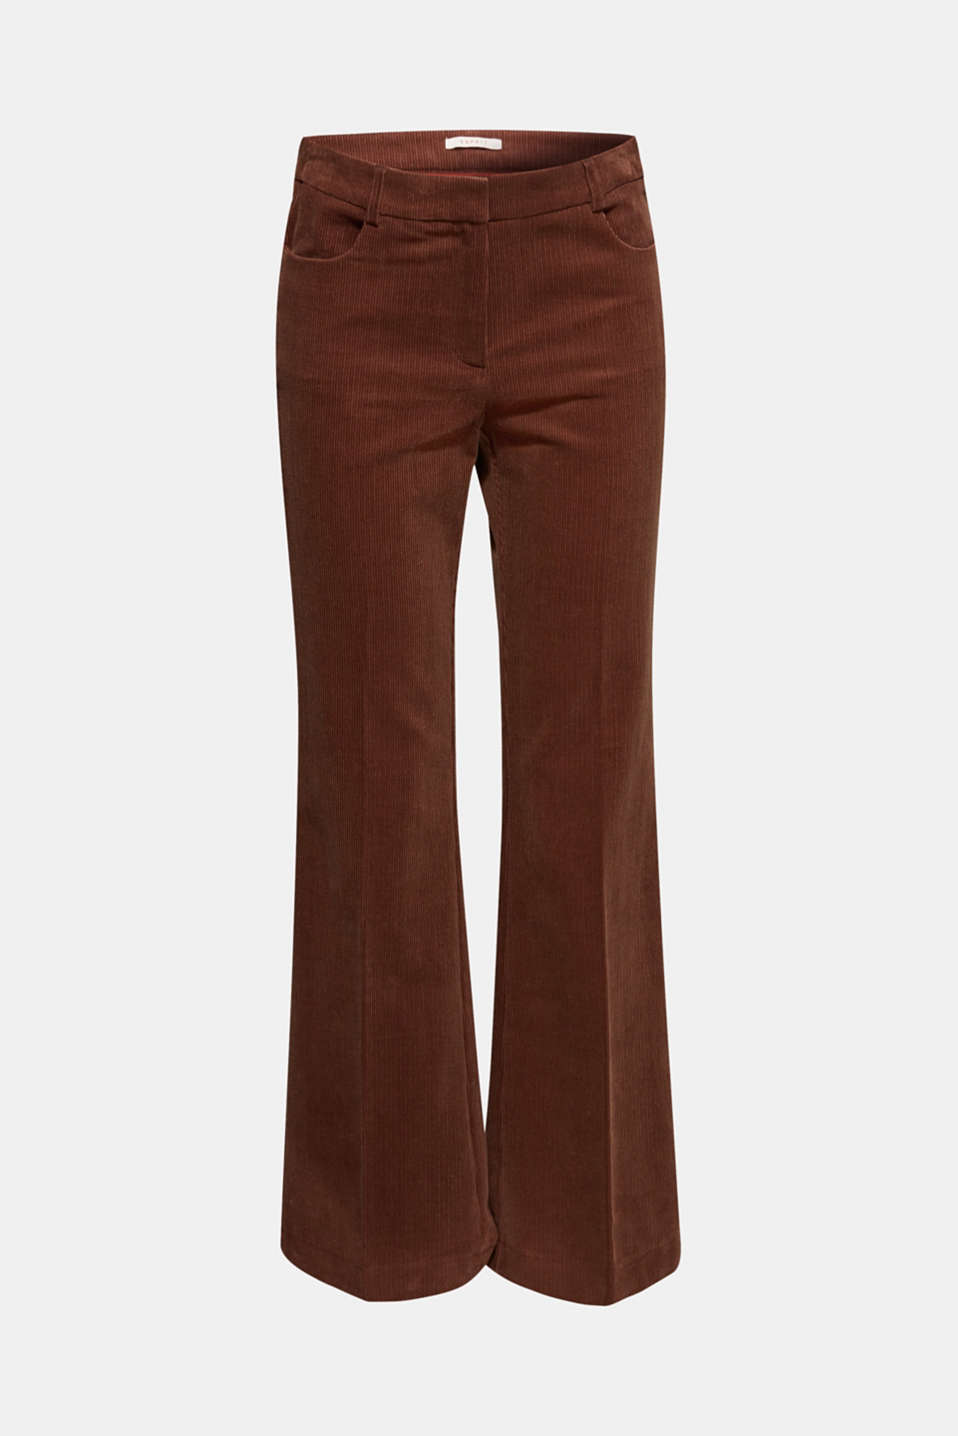 Pants woven, DARK BROWN, detail image number 7